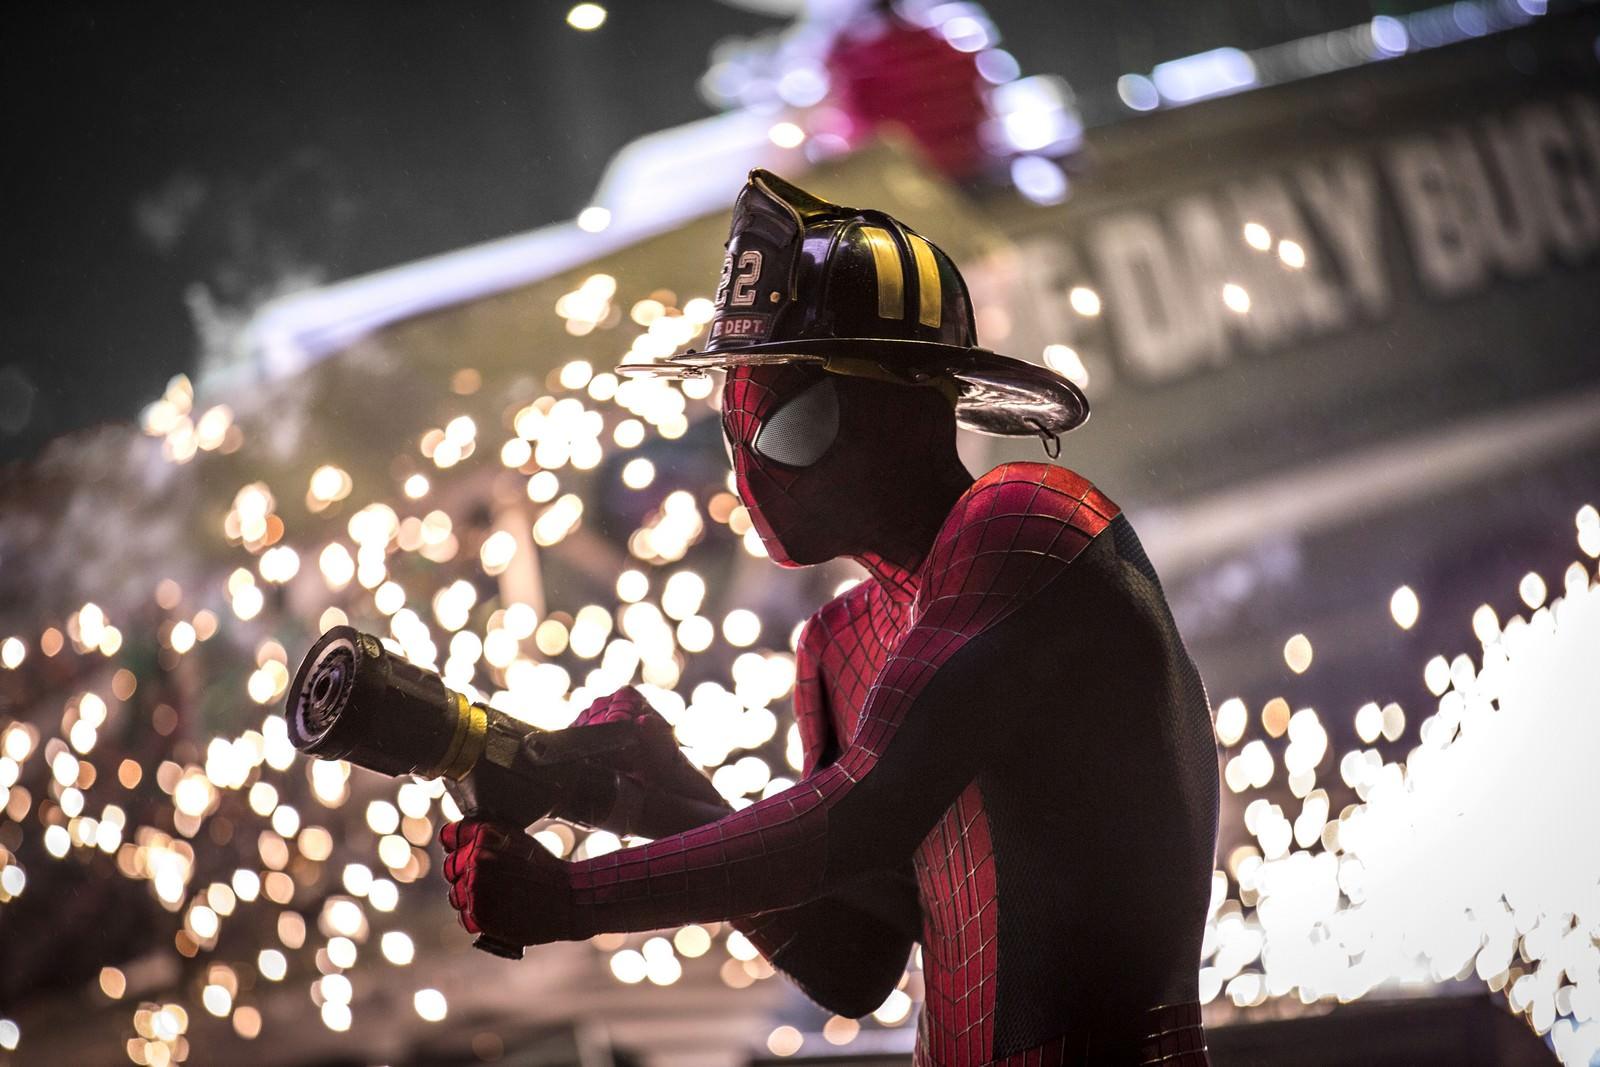 Movie, The Amazing Spider-Man 2(美國, 2014年) / 蜘蛛人驚奇再起2:電光之戰(台灣) / 超凡蜘蛛侠2(中國) / 蜘蛛俠2:決戰電魔(香港), 電影劇照